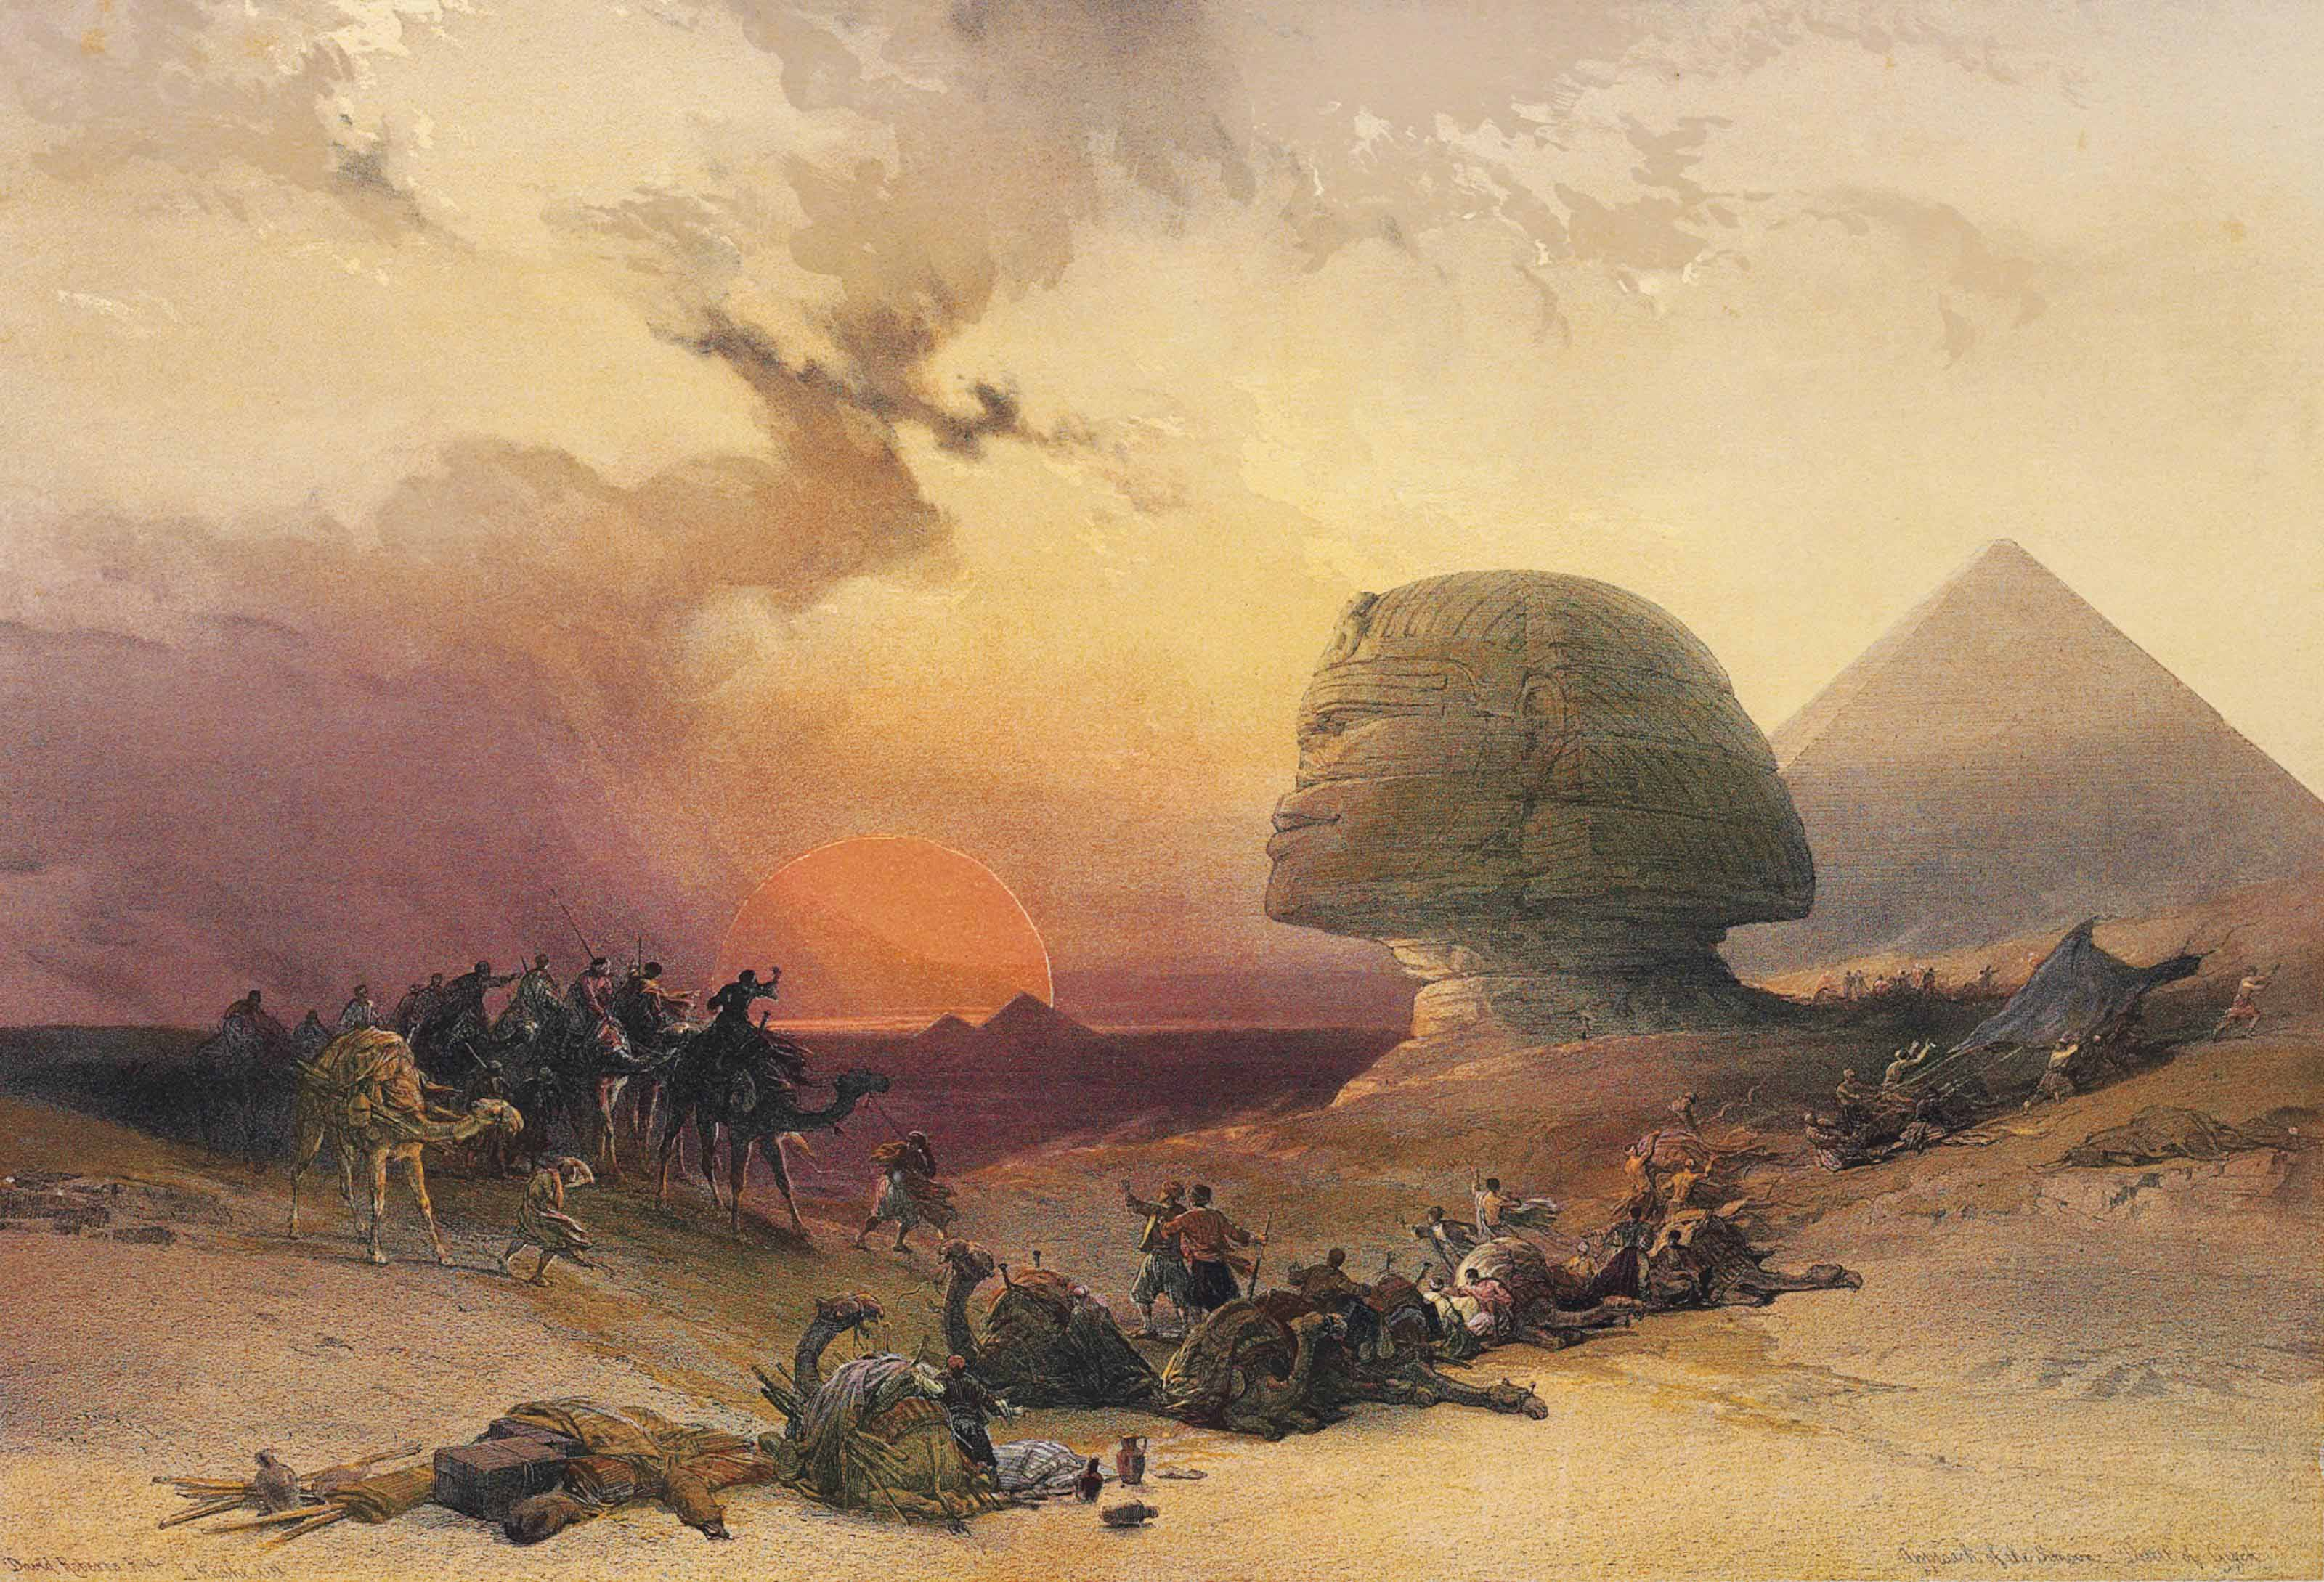 DAVID ROBERTS (1796-1864)